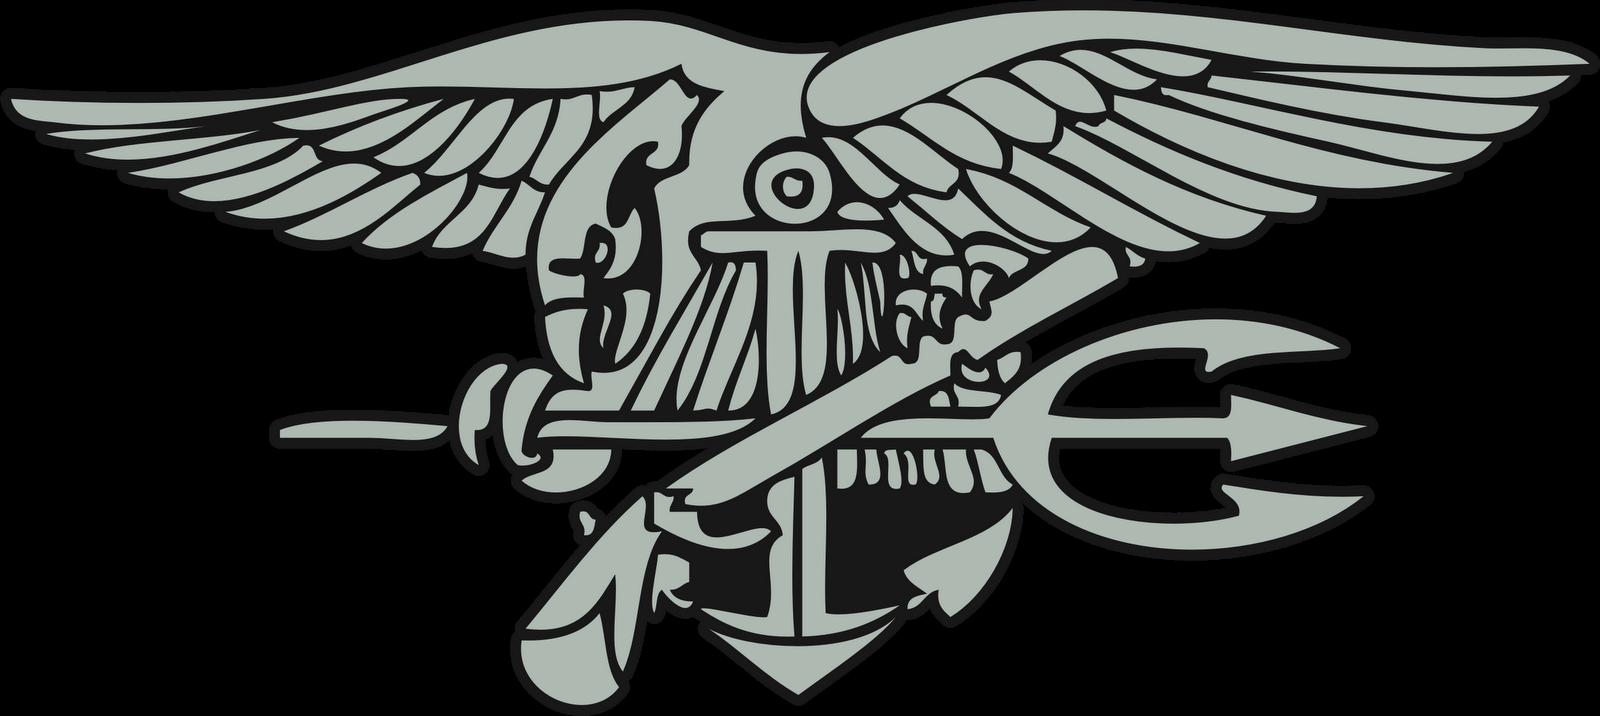 Image result for navy seals logo